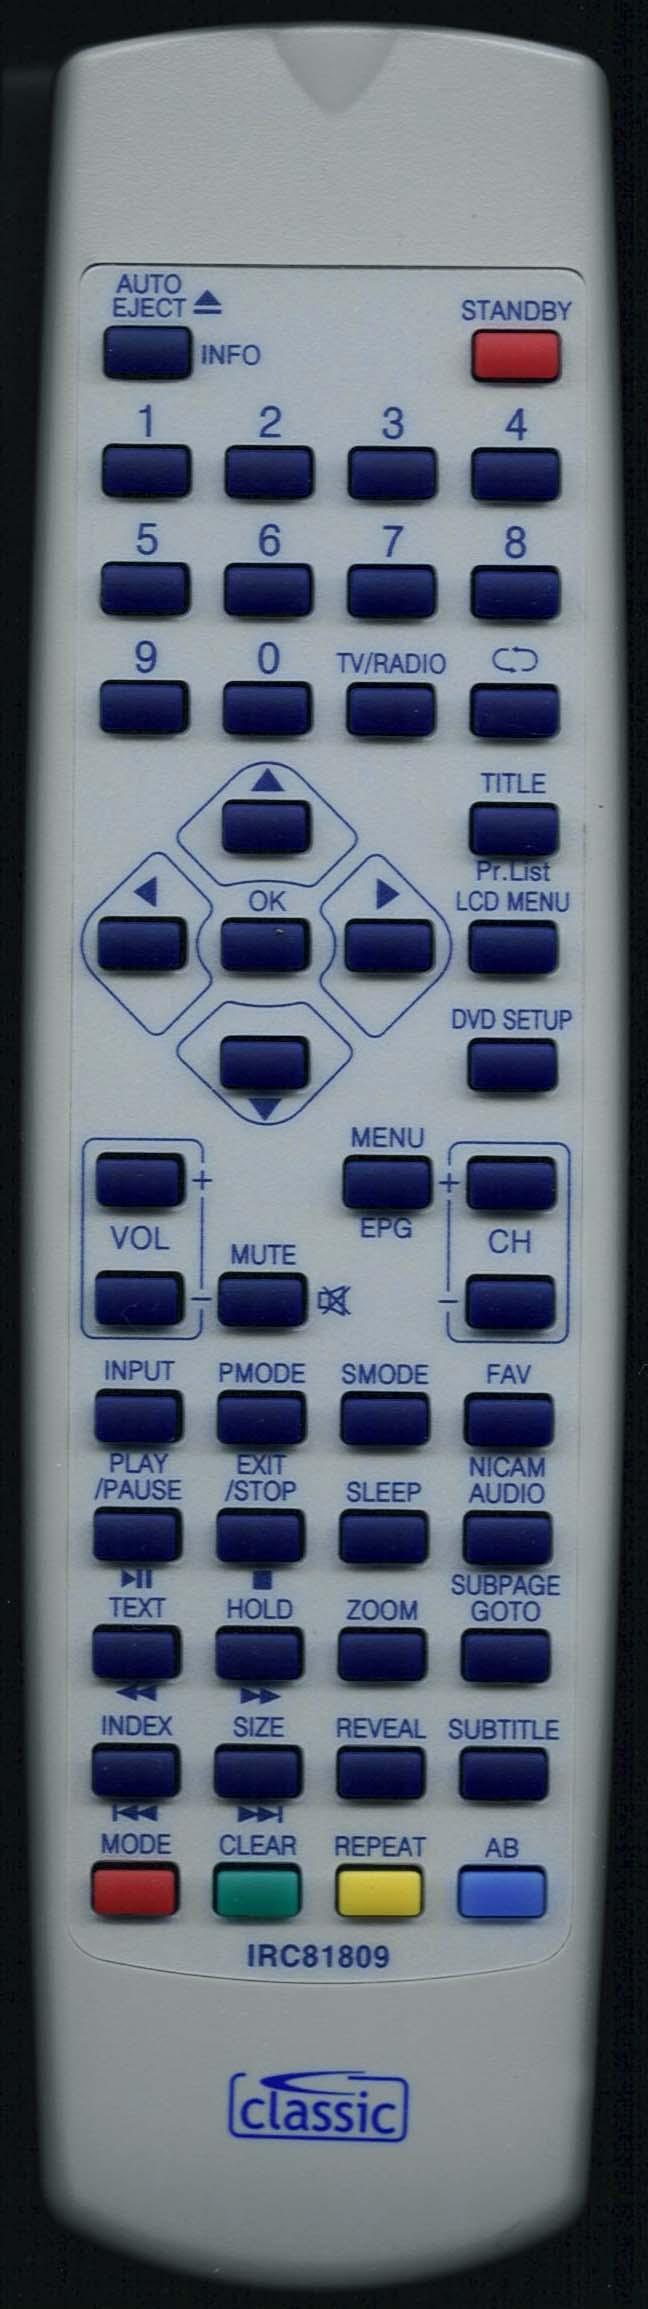 Baird OR19DVD Remote Control